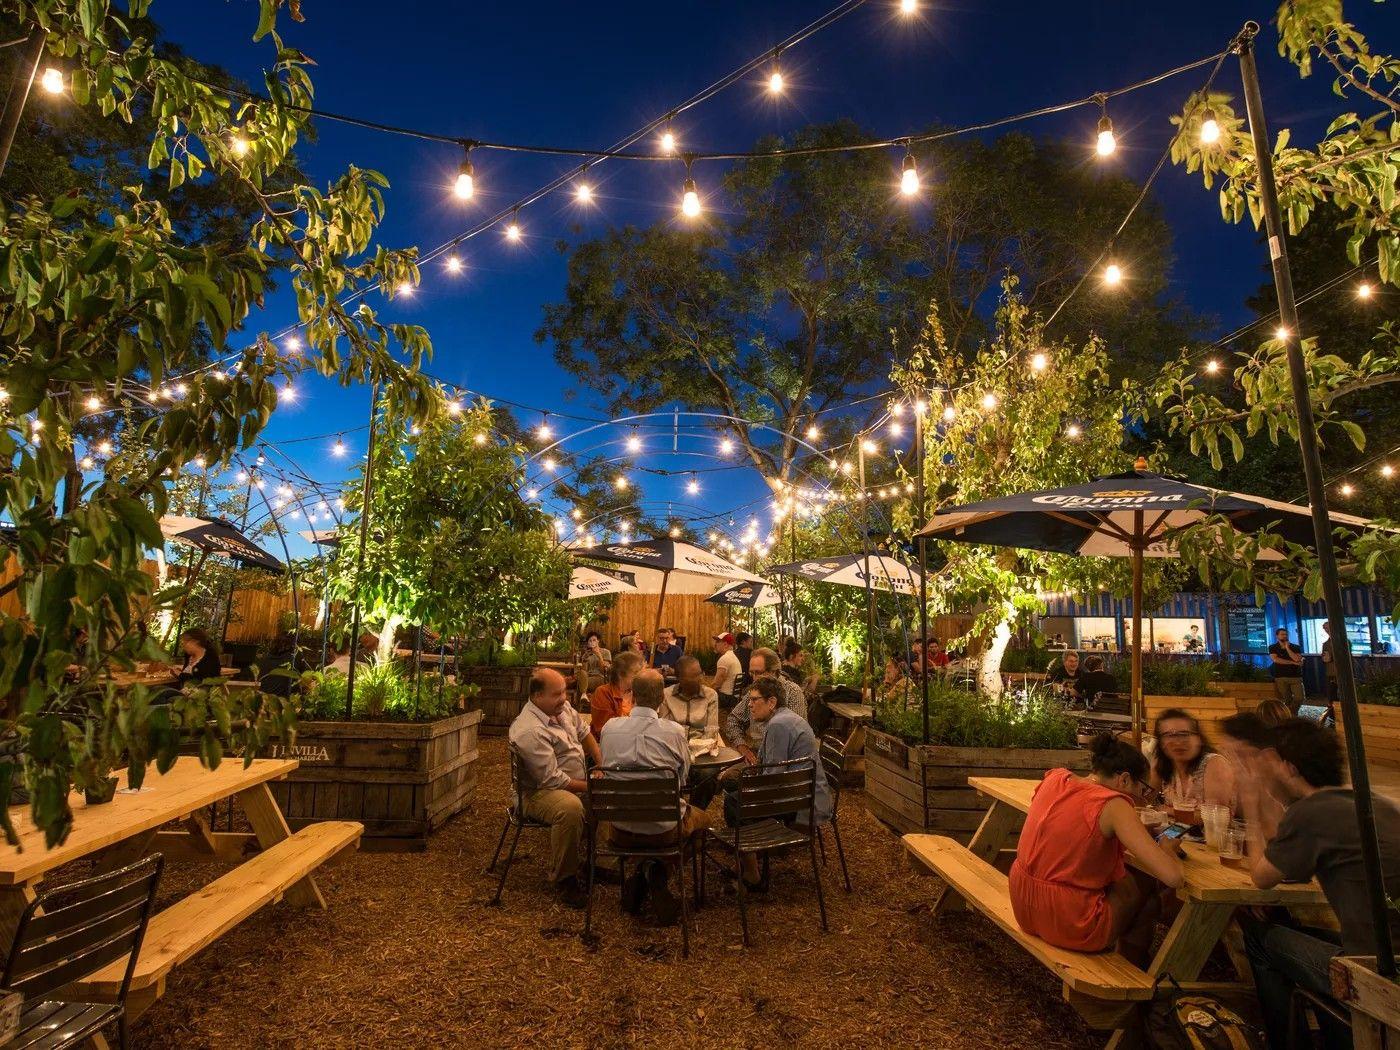 Pin By Gabi Rodriguez On Beer Garden In 2020 Backyard Beer Garden Beer Garden Design Beer Garden Ideas